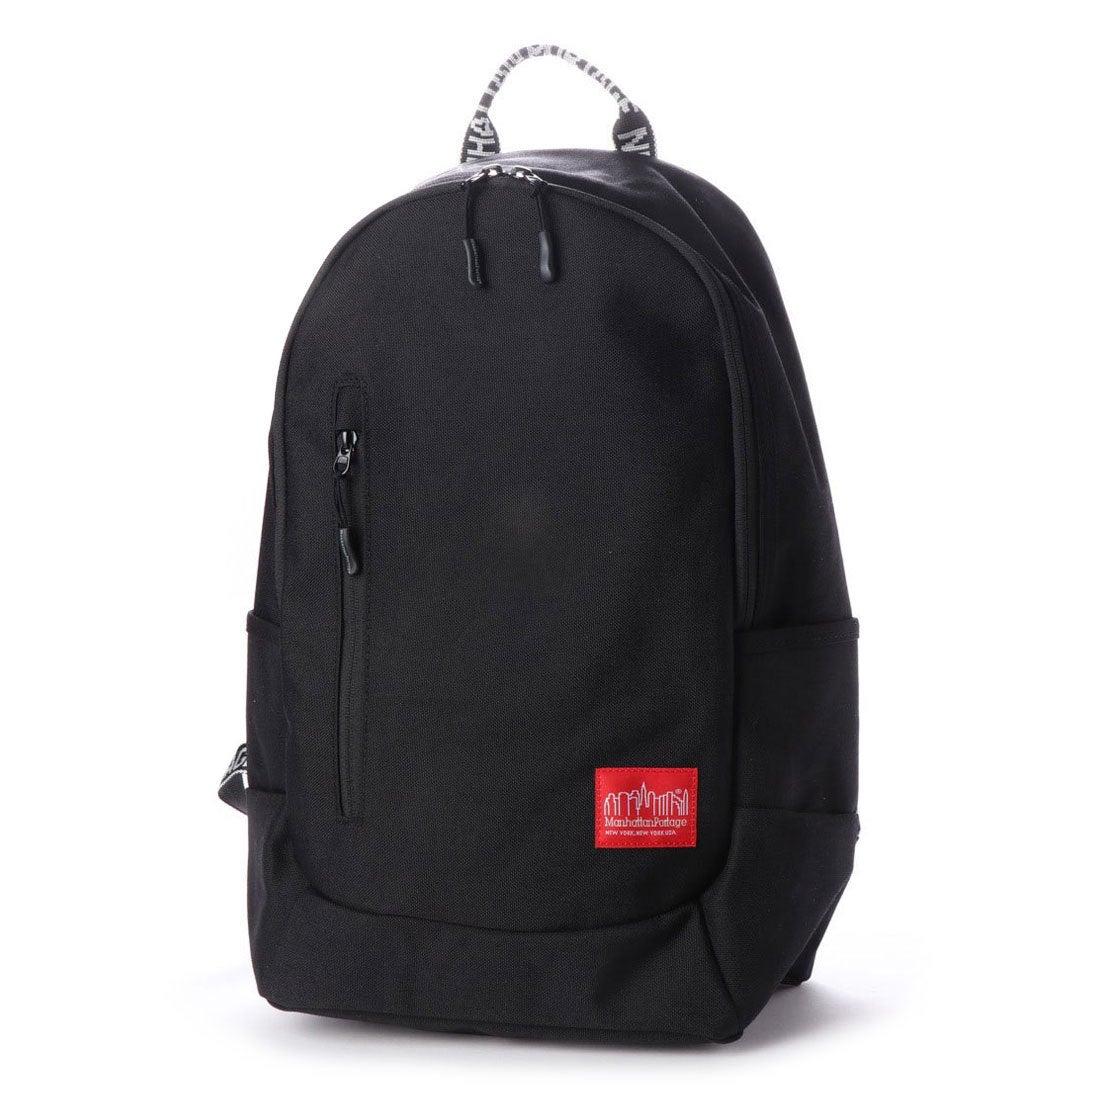 8c8000490094 マンハッタンポーテージ Manhattan Portage IDENT? Intrepid Backpack JR (Black)  -靴&ファッション通販 ロコンド〜自宅で試着、気軽に返品